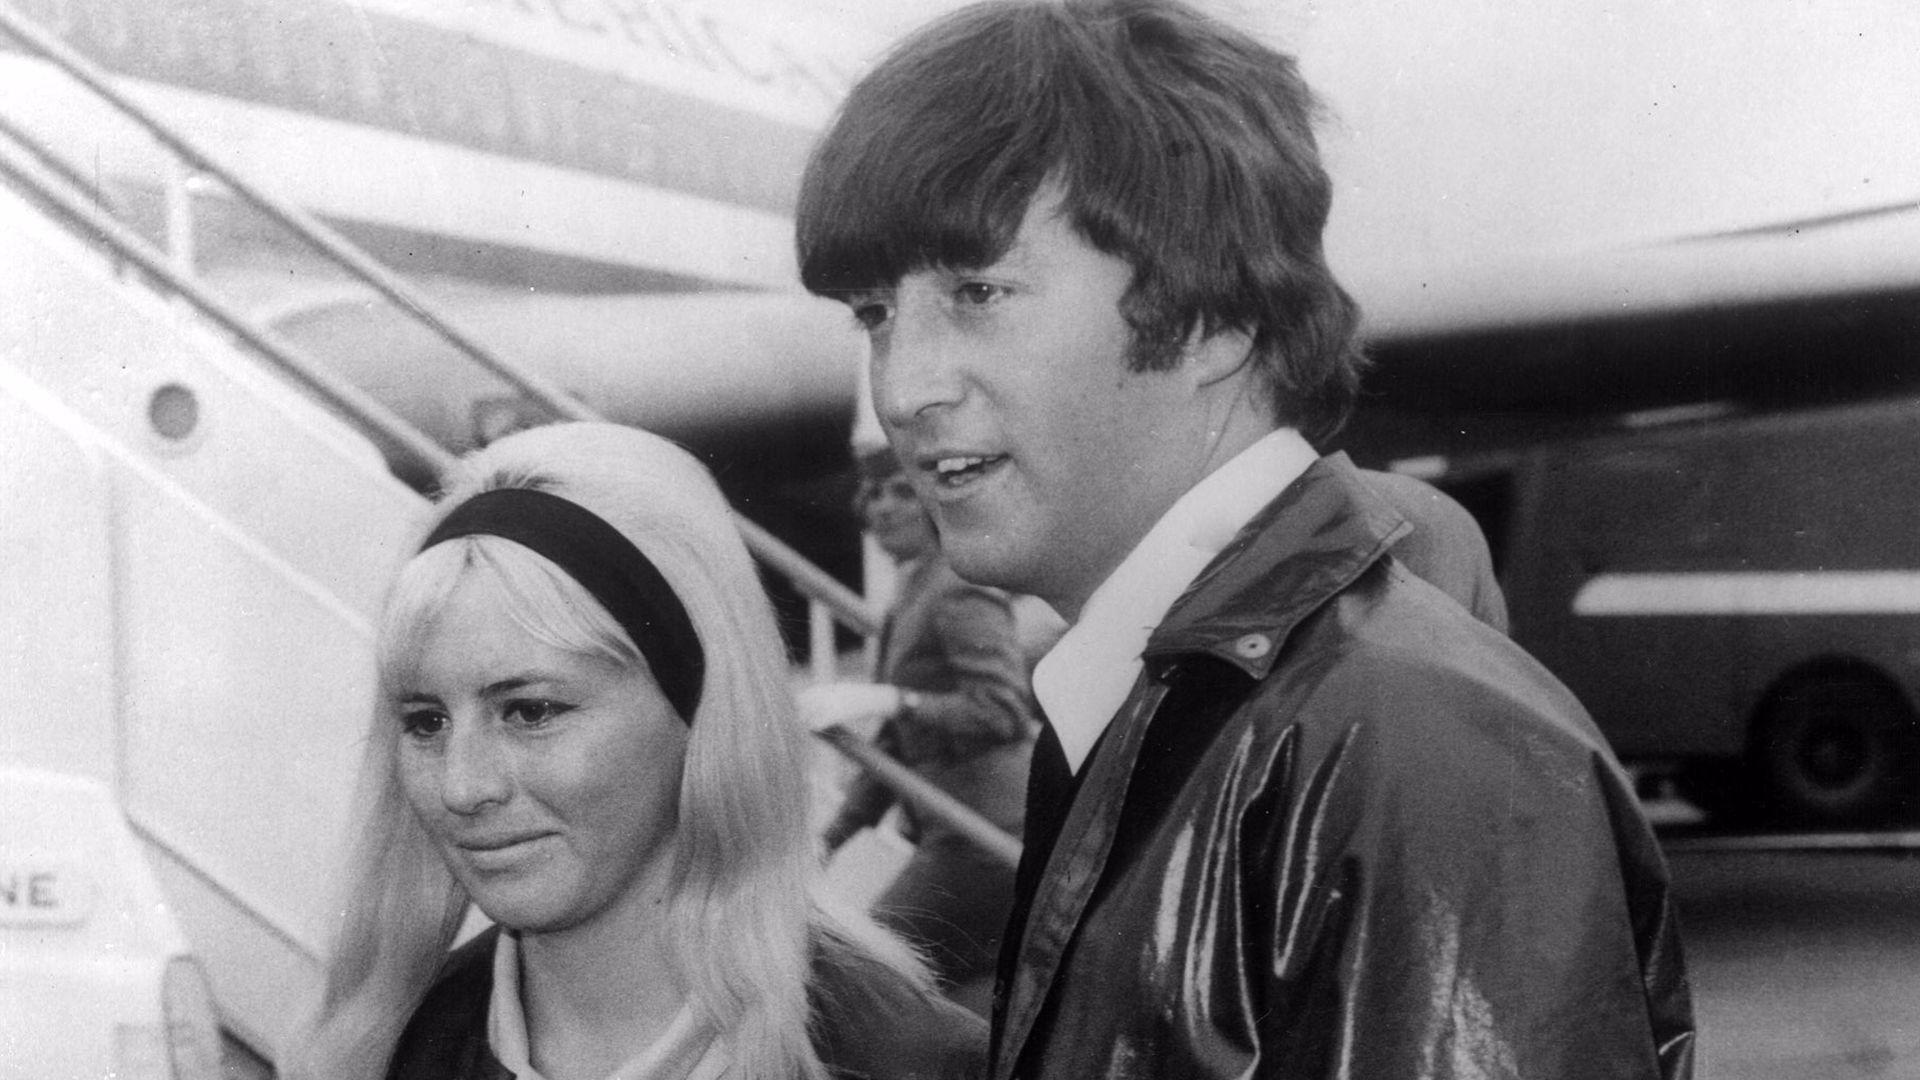 Die 1. Frau von Beatles-Legende John Lennon ist tot! | Promiflash.de